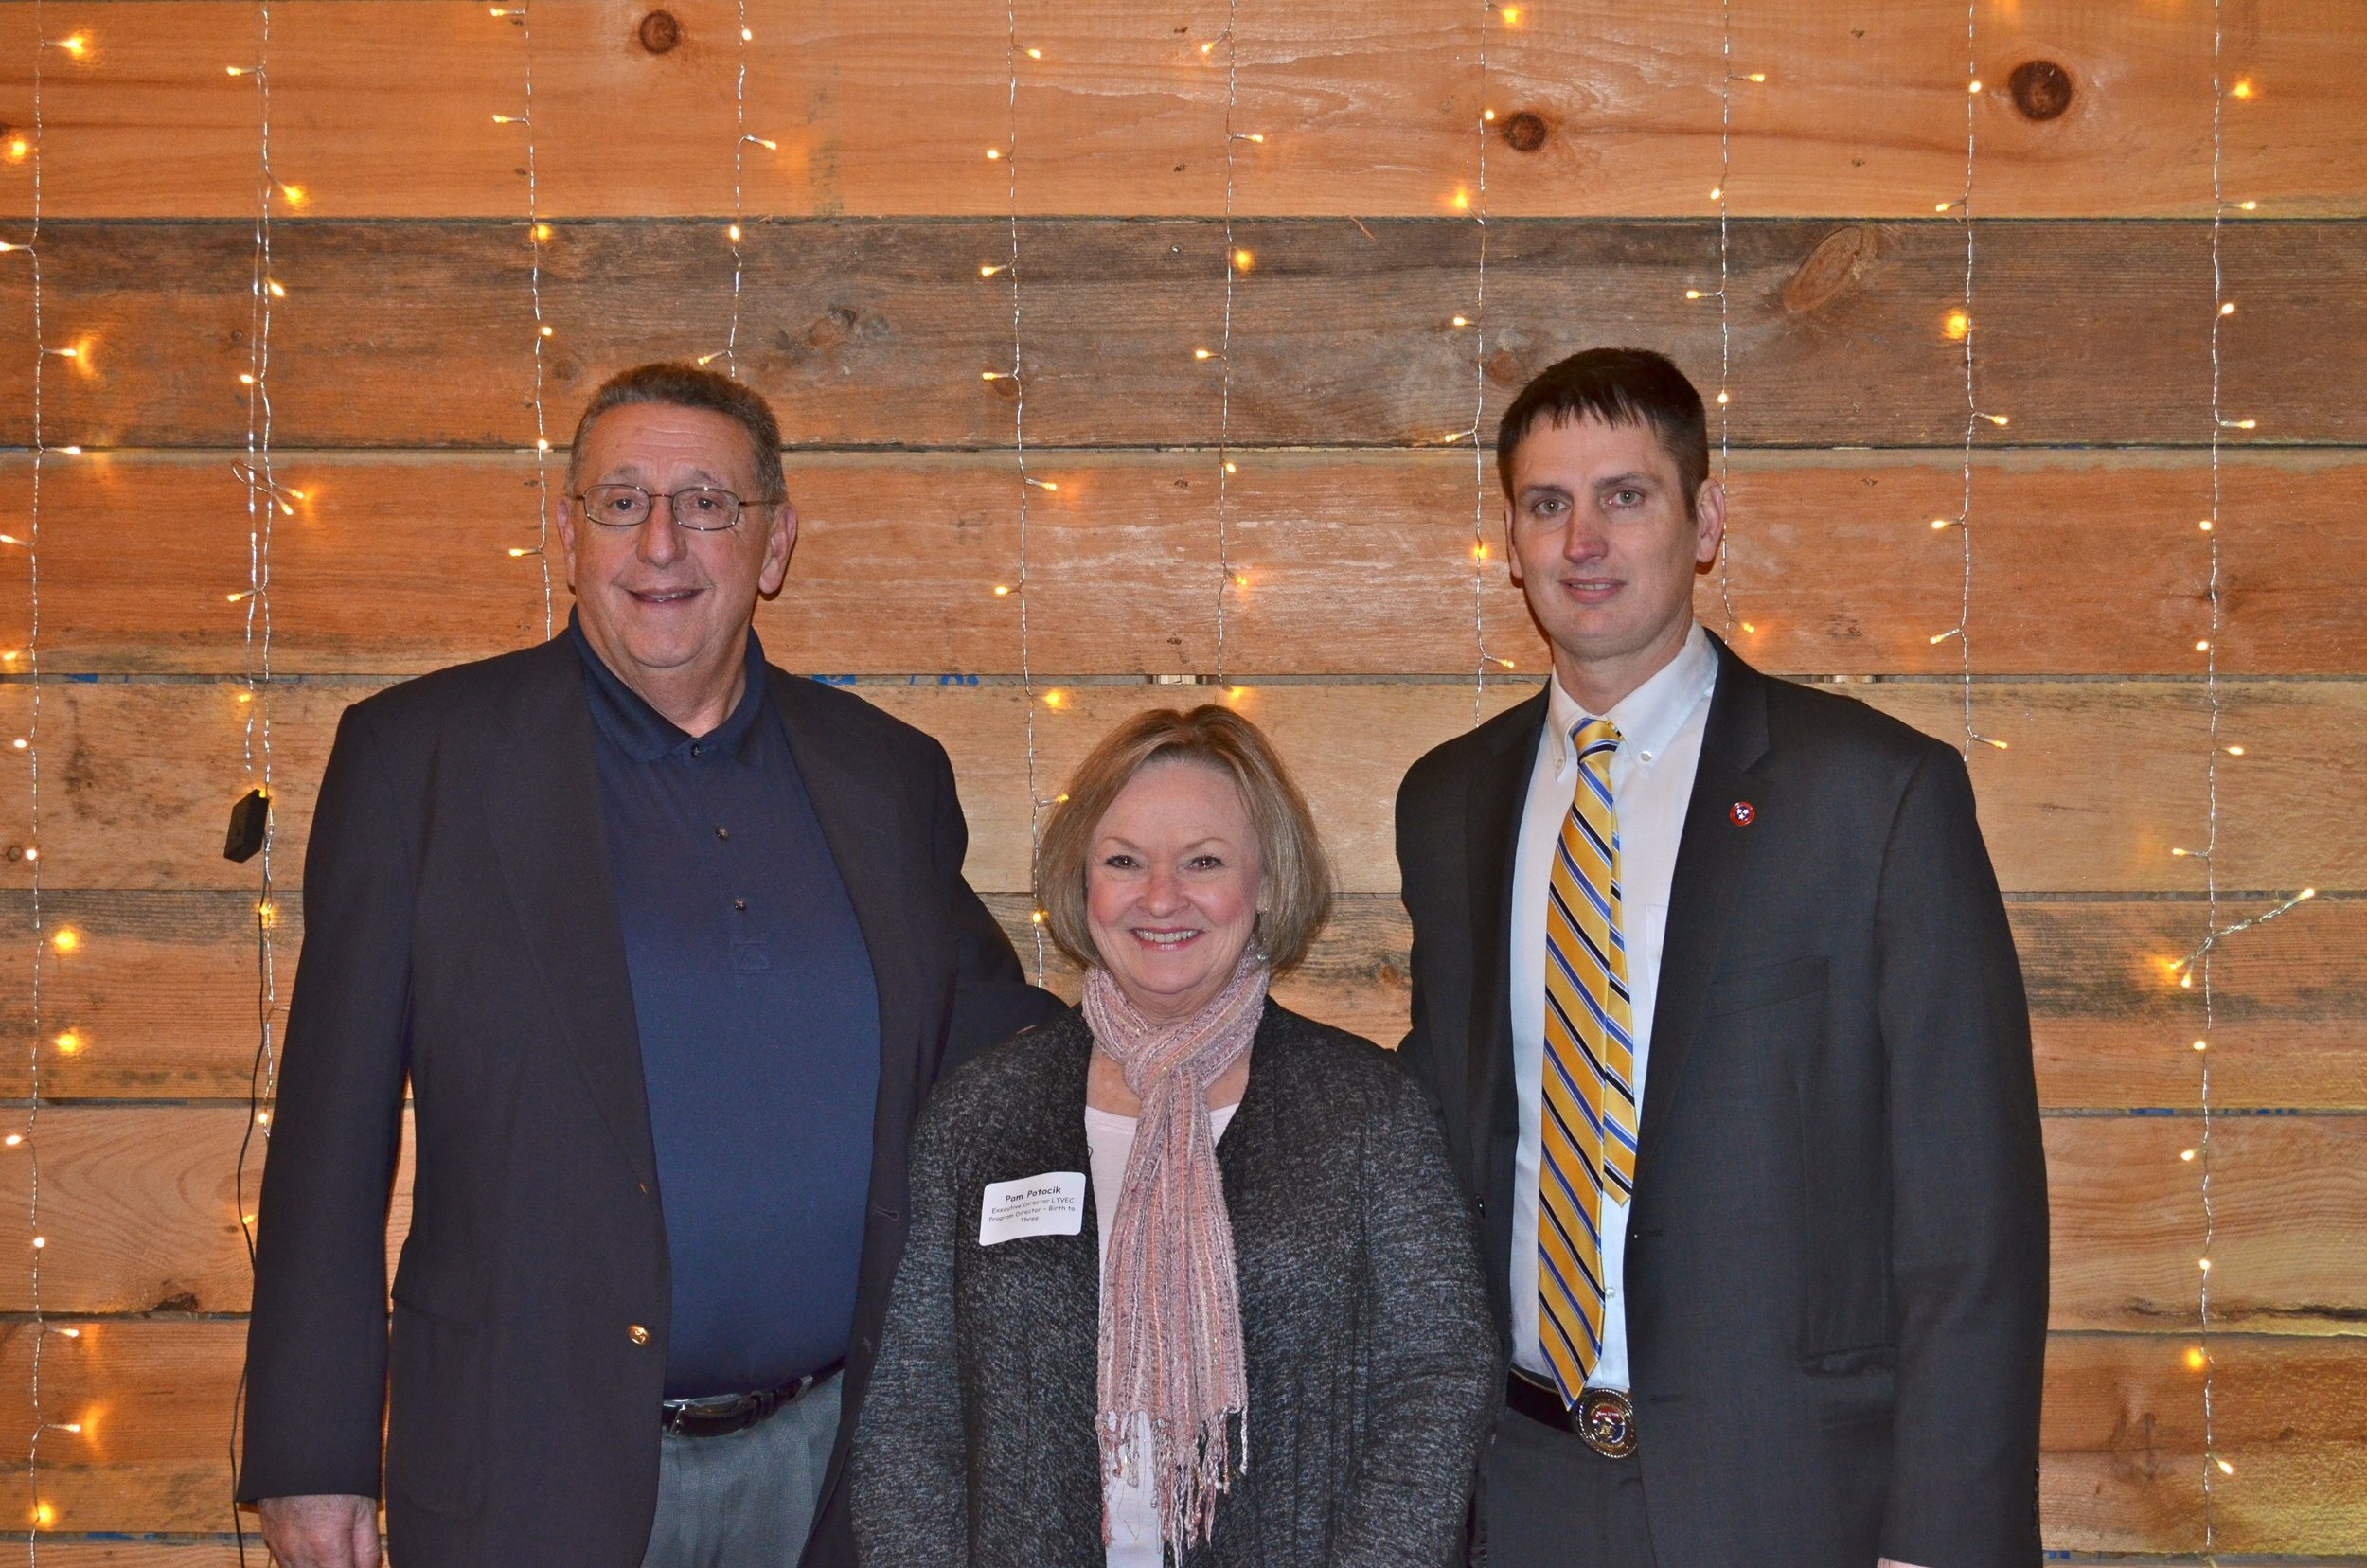 Kent Calfee, Pam Potocik, and Lowell Russell